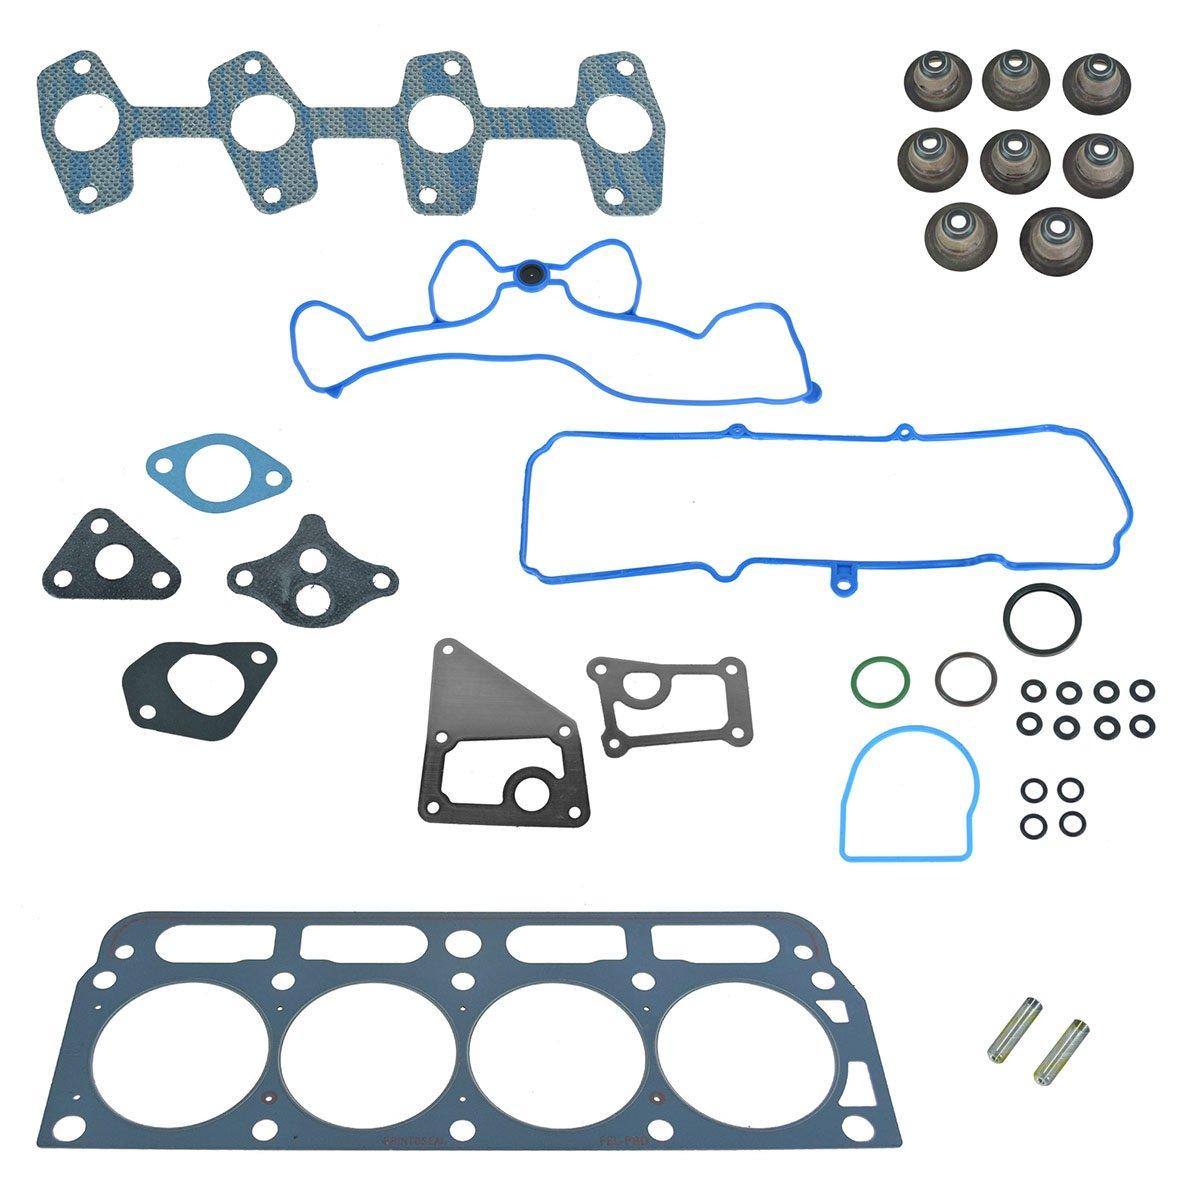 FEL-PRO Head Gasket /& Bolt Kit for Cavalier Sunfire S10 S15 Sonoma Hombre 2.2L